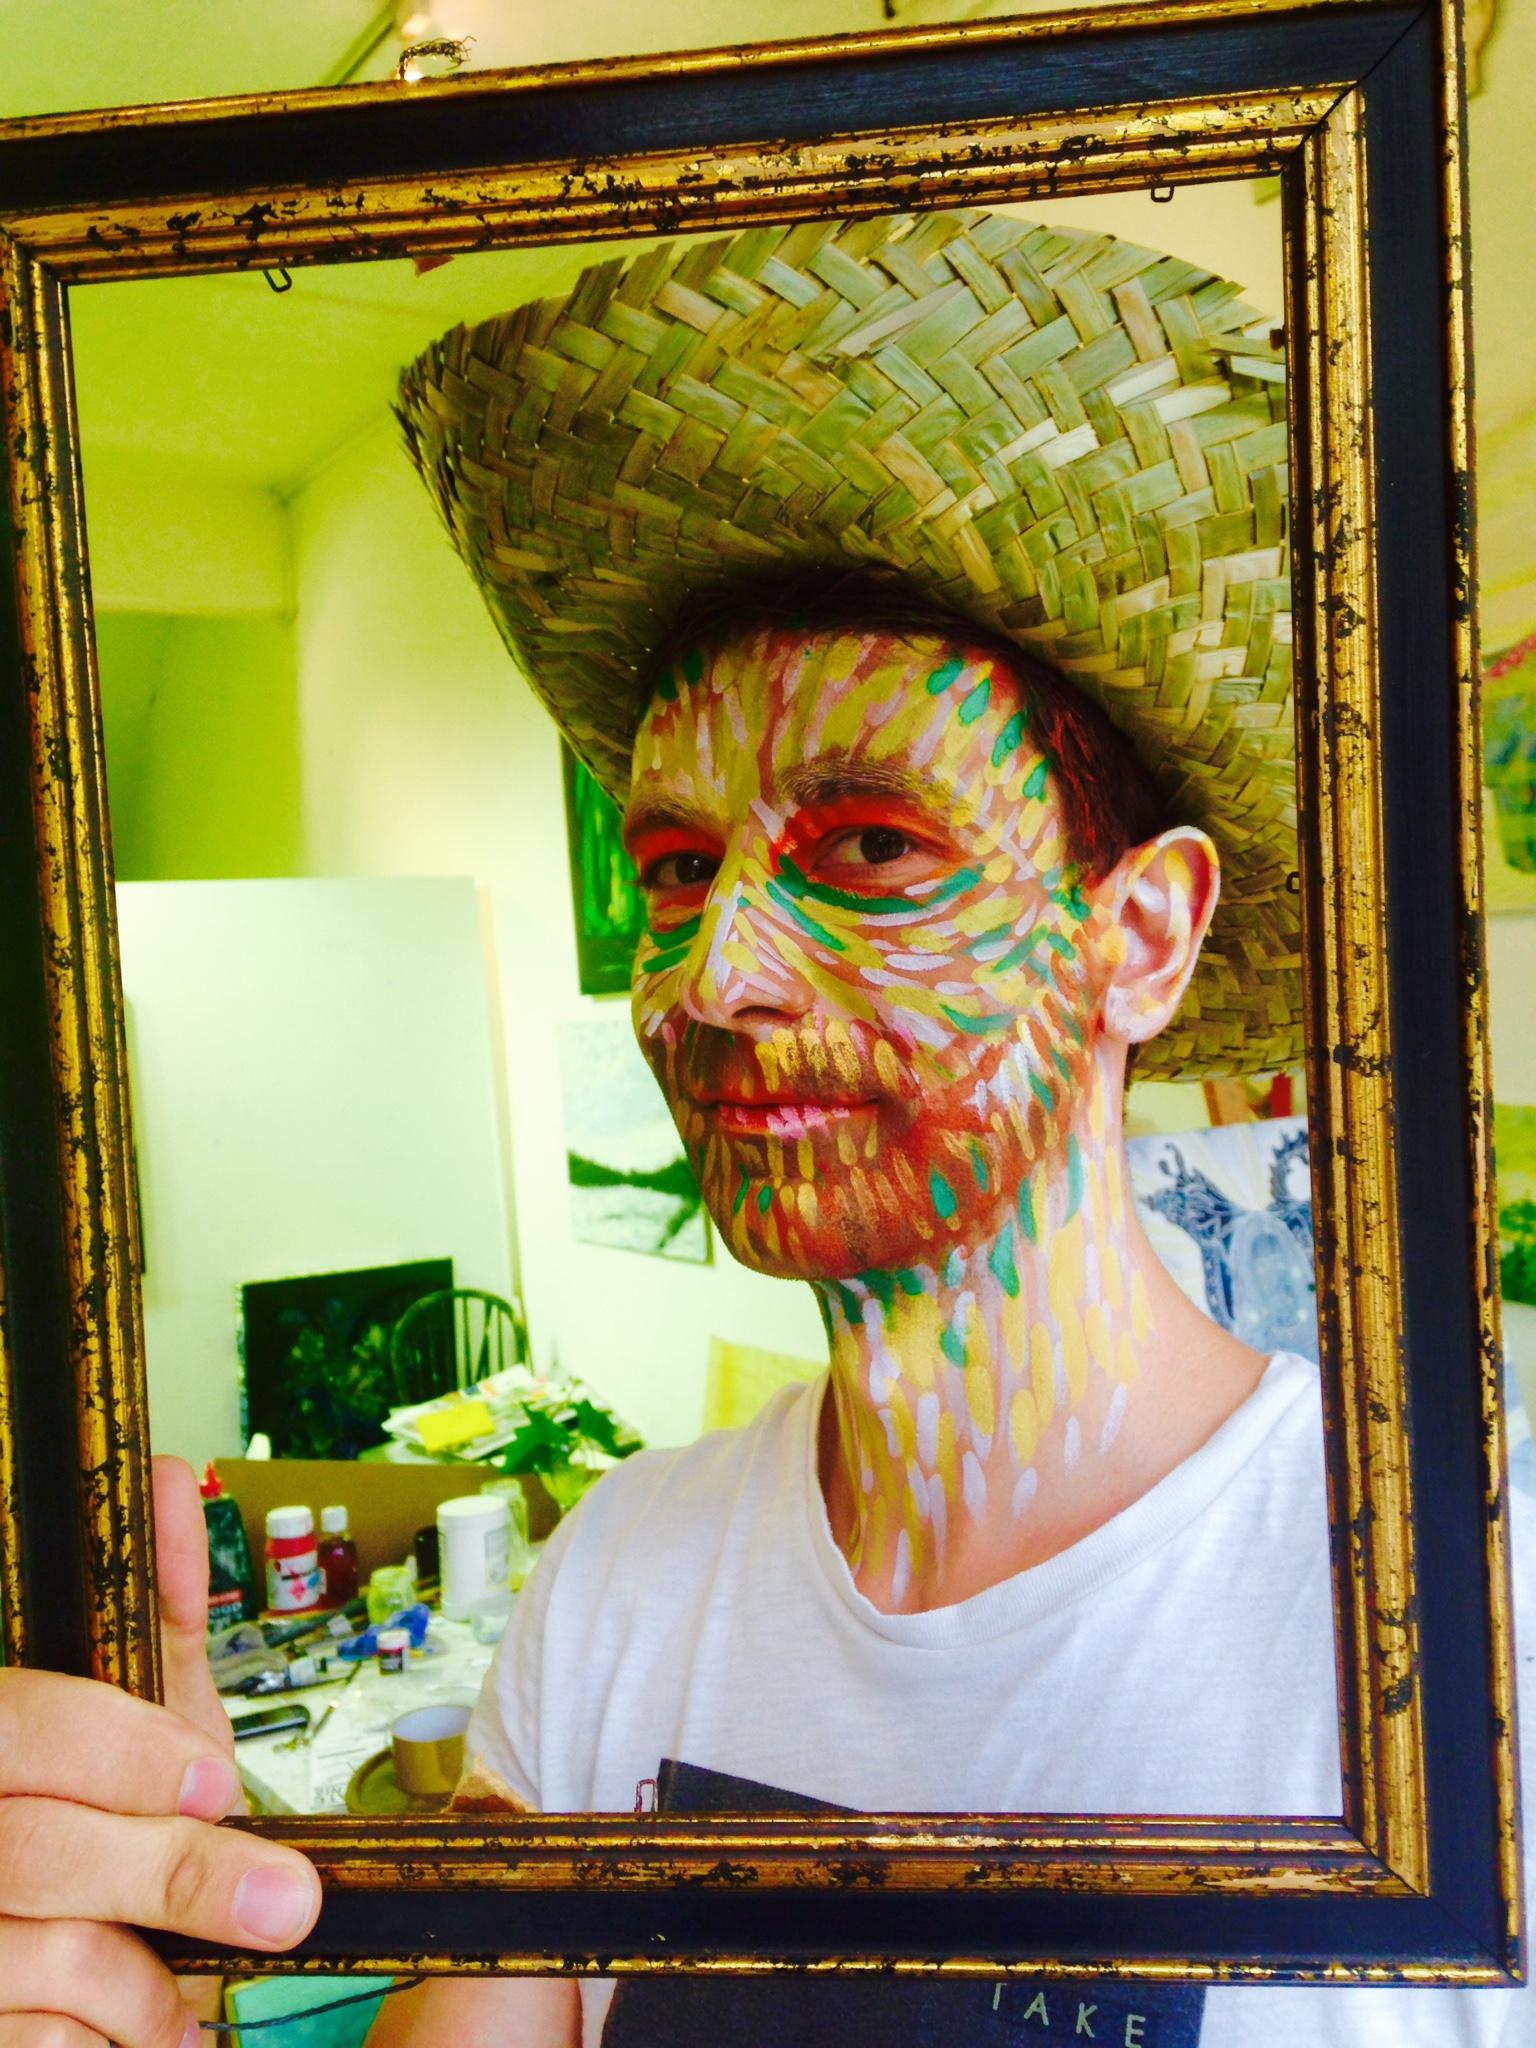 Van Gogh Self Portrait with Straw Hat 2